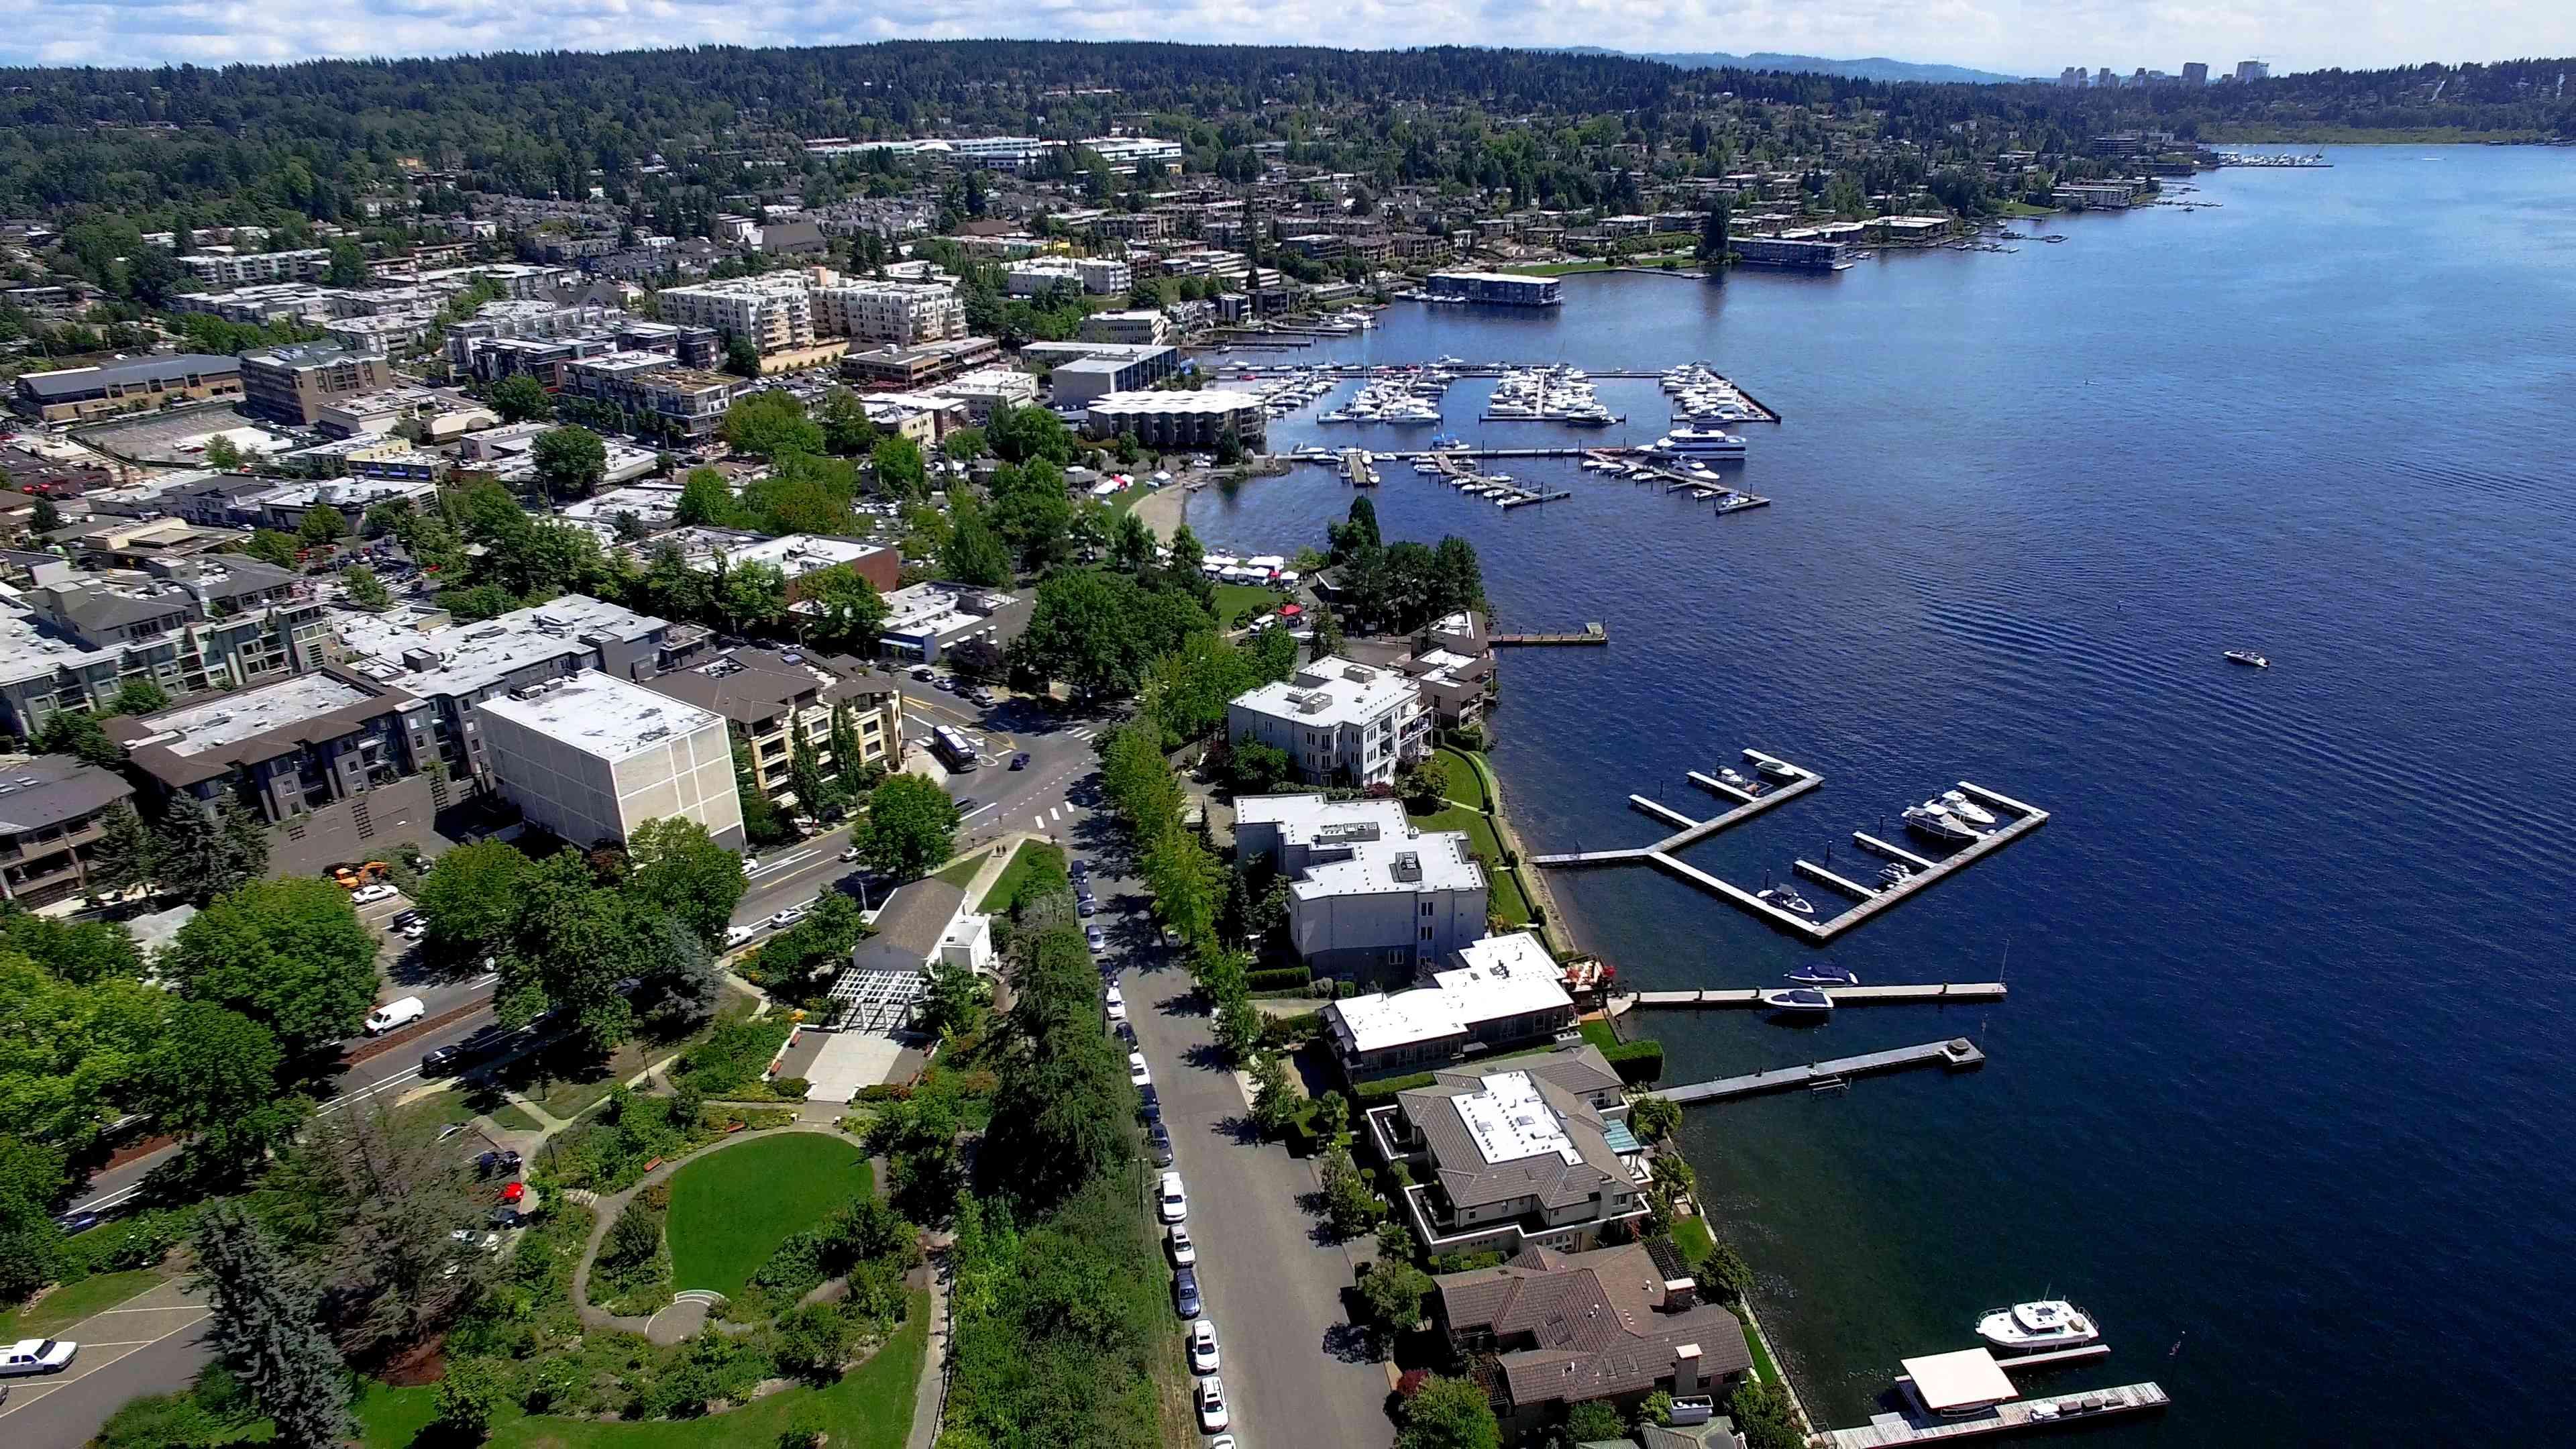 Kirkland, WA Waterfront Aerial Panoramic Lake Washington, Bellevue Skyline